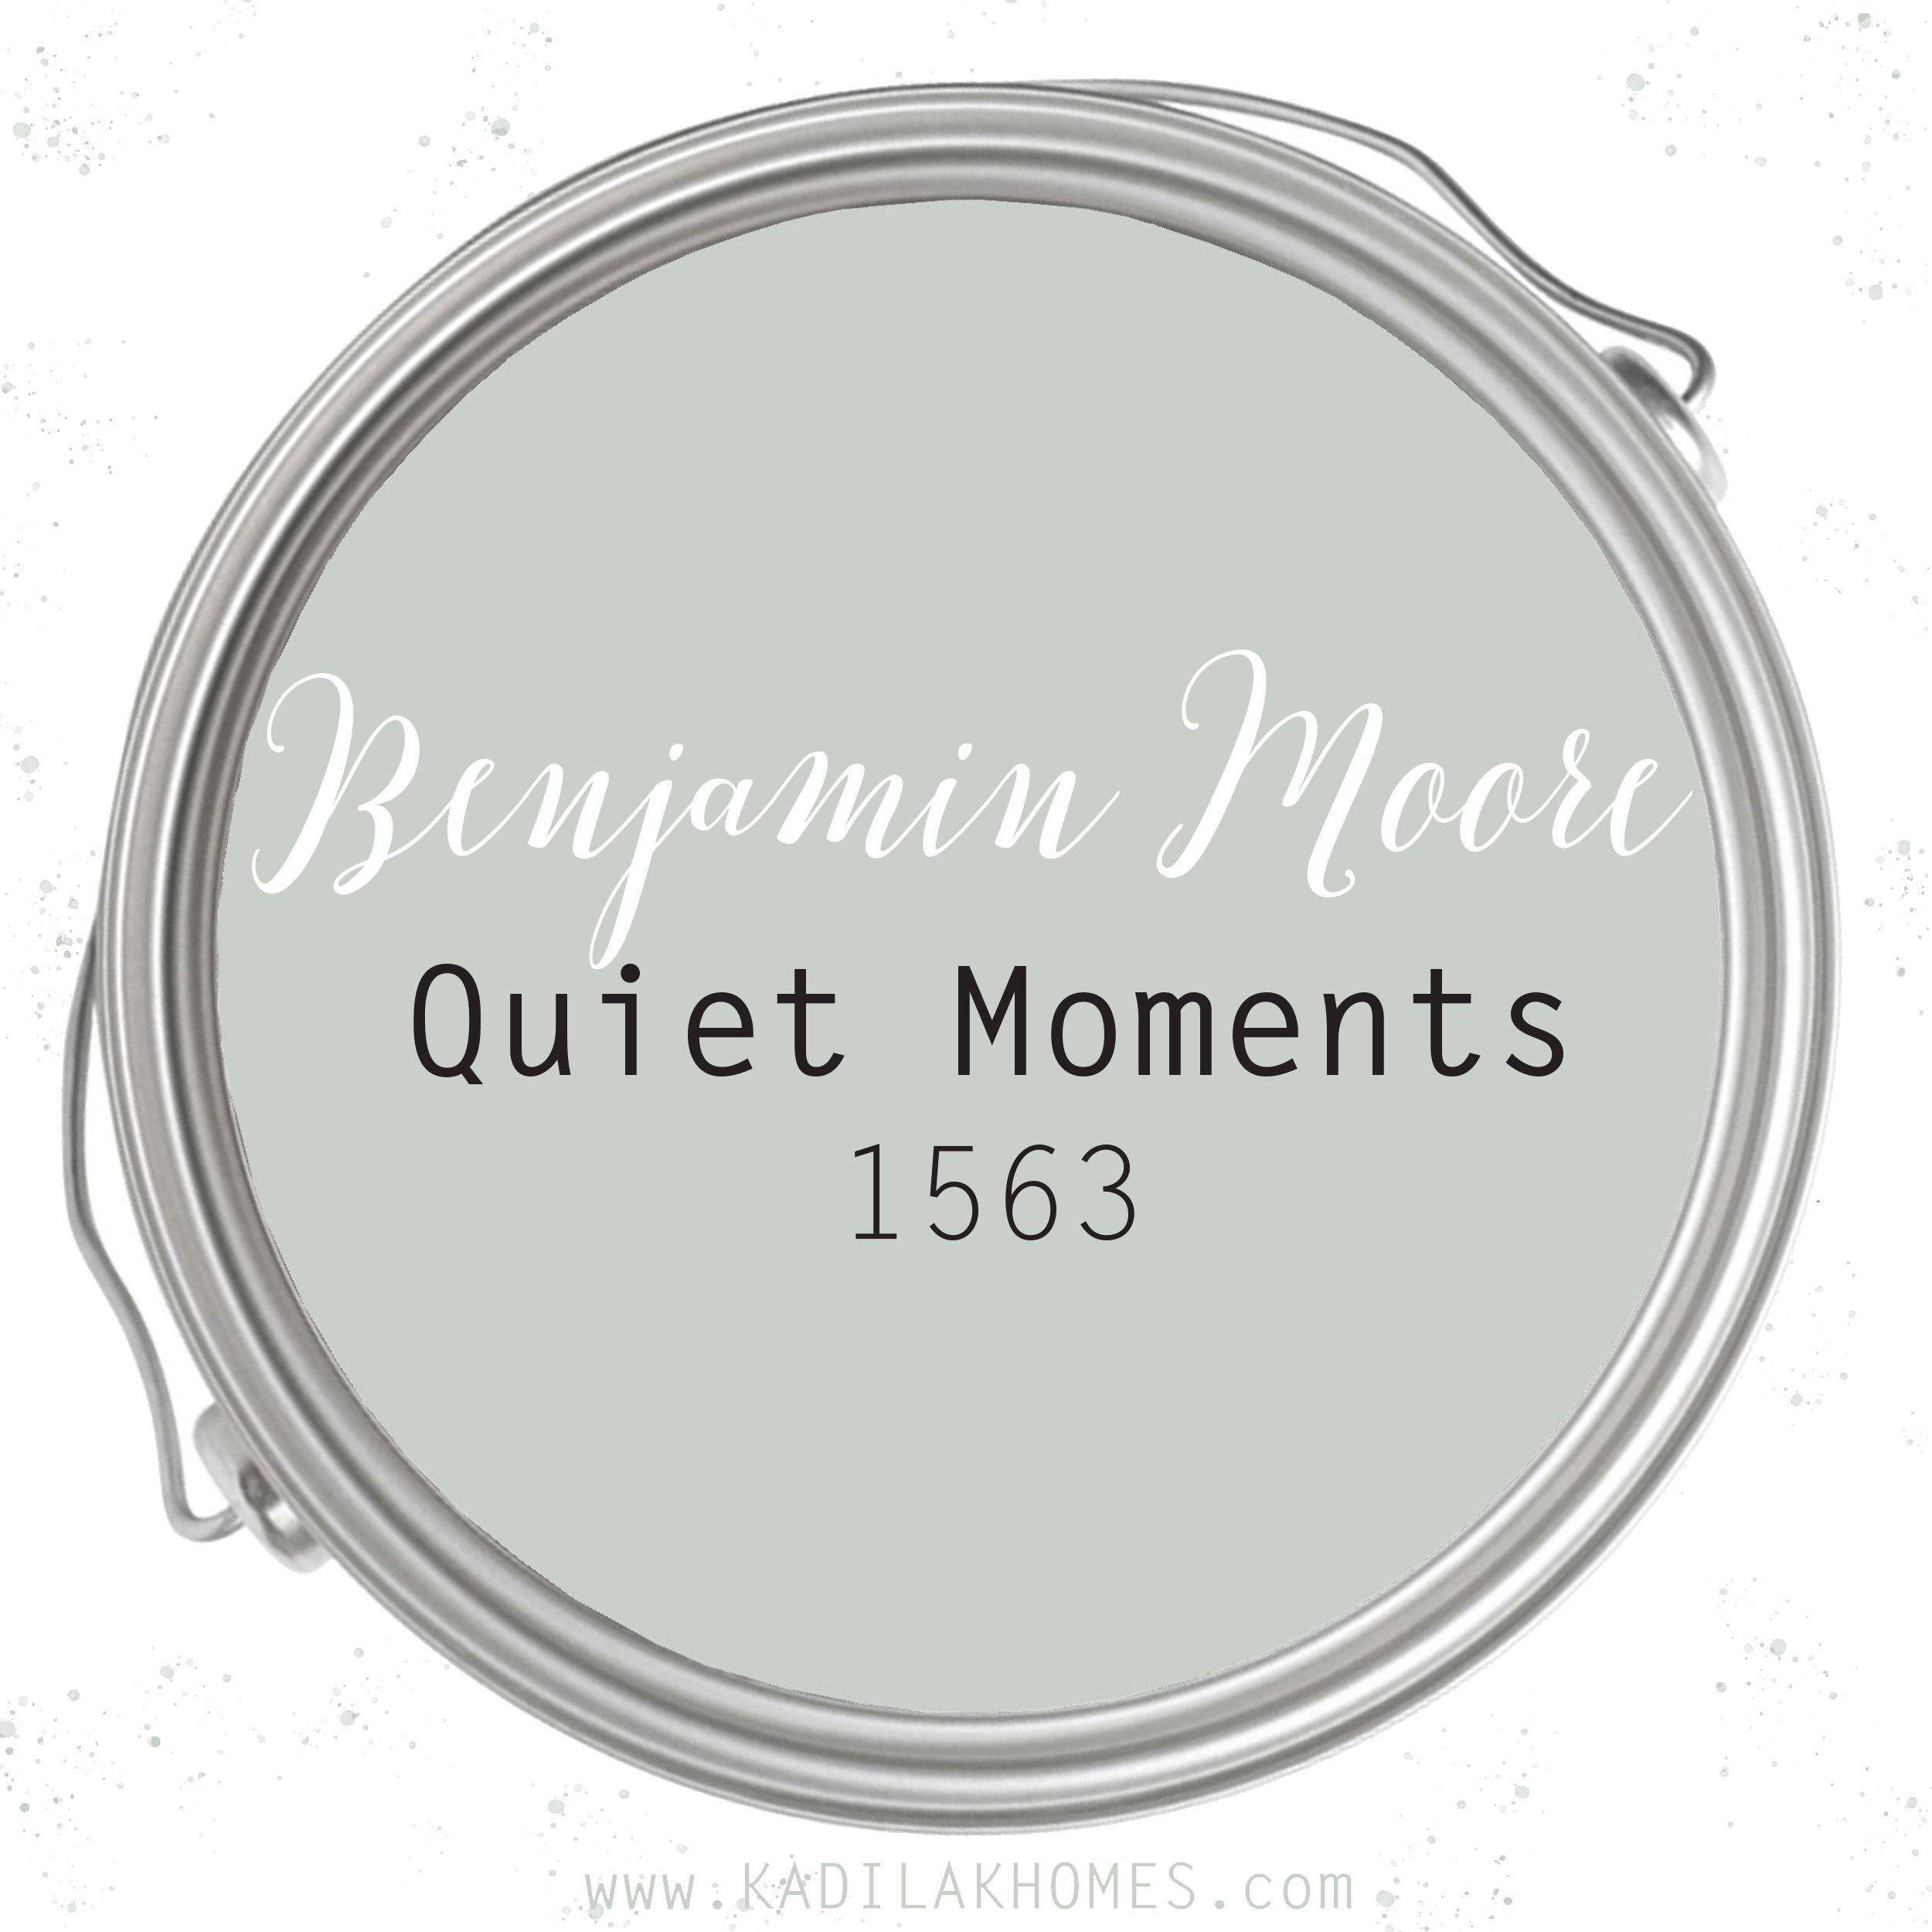 Photo of Quiet Moments 1563 by Benjamin Moore